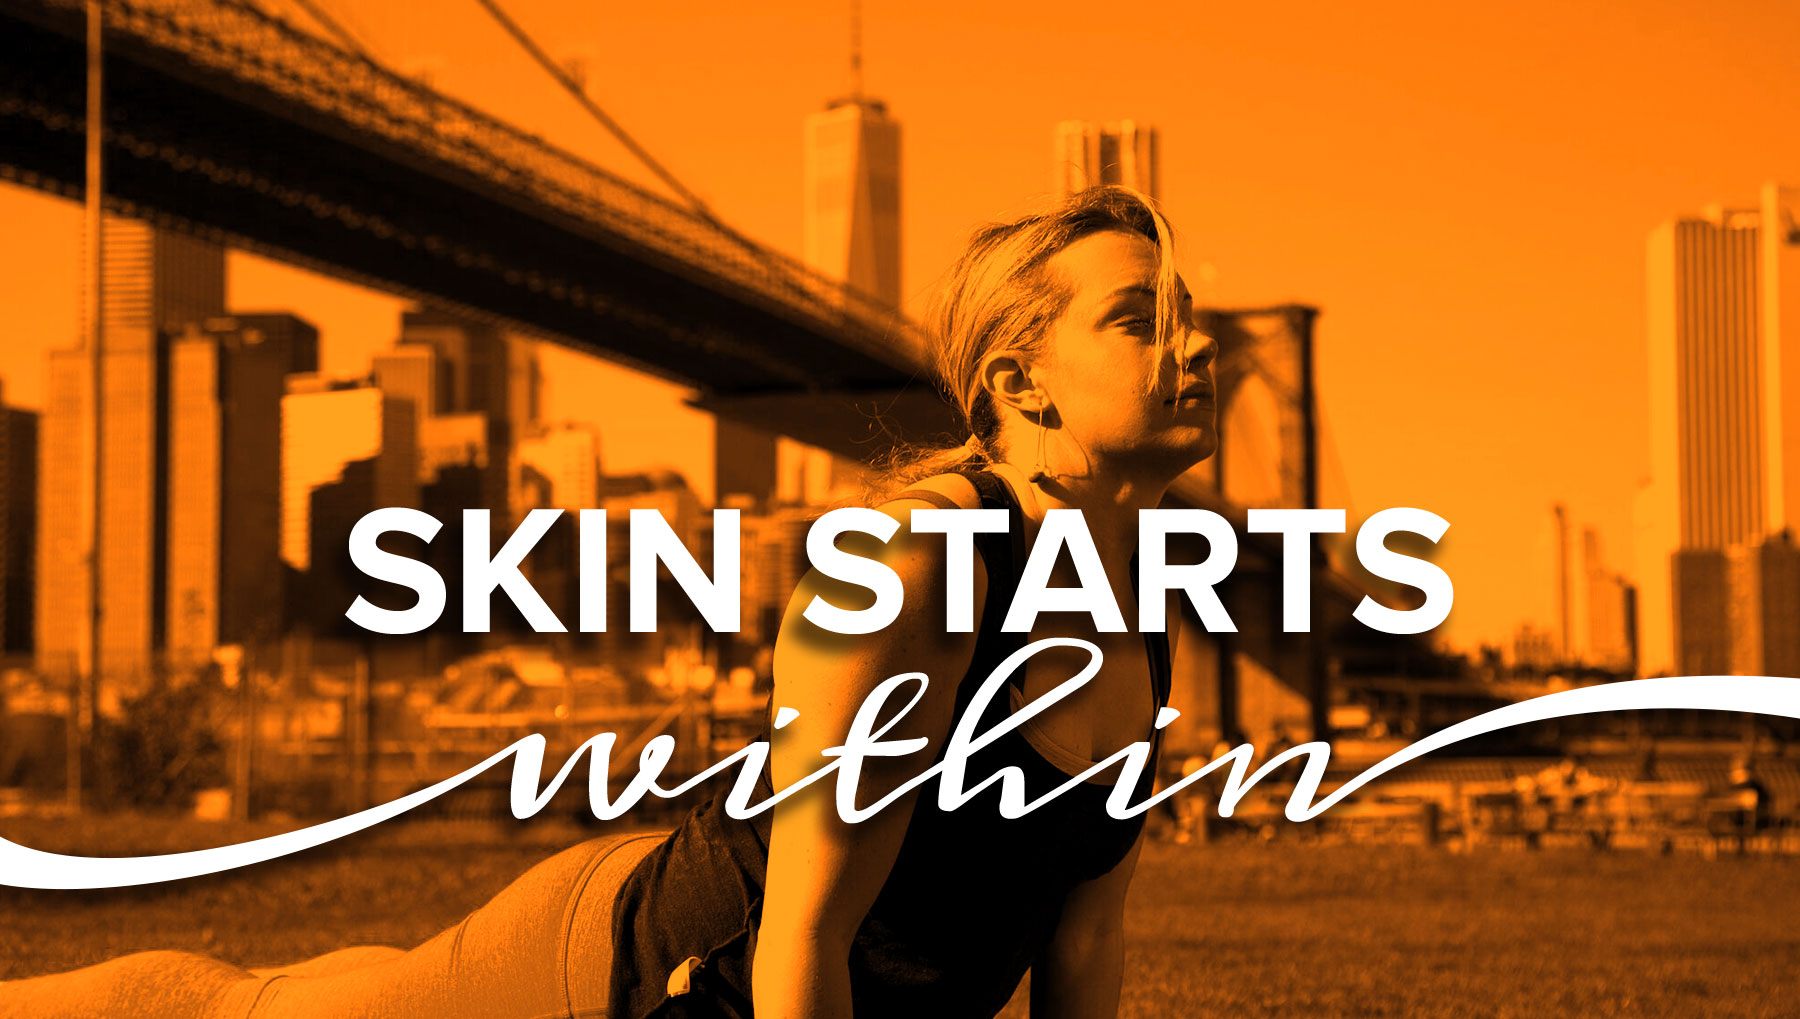 Skin Starts Within